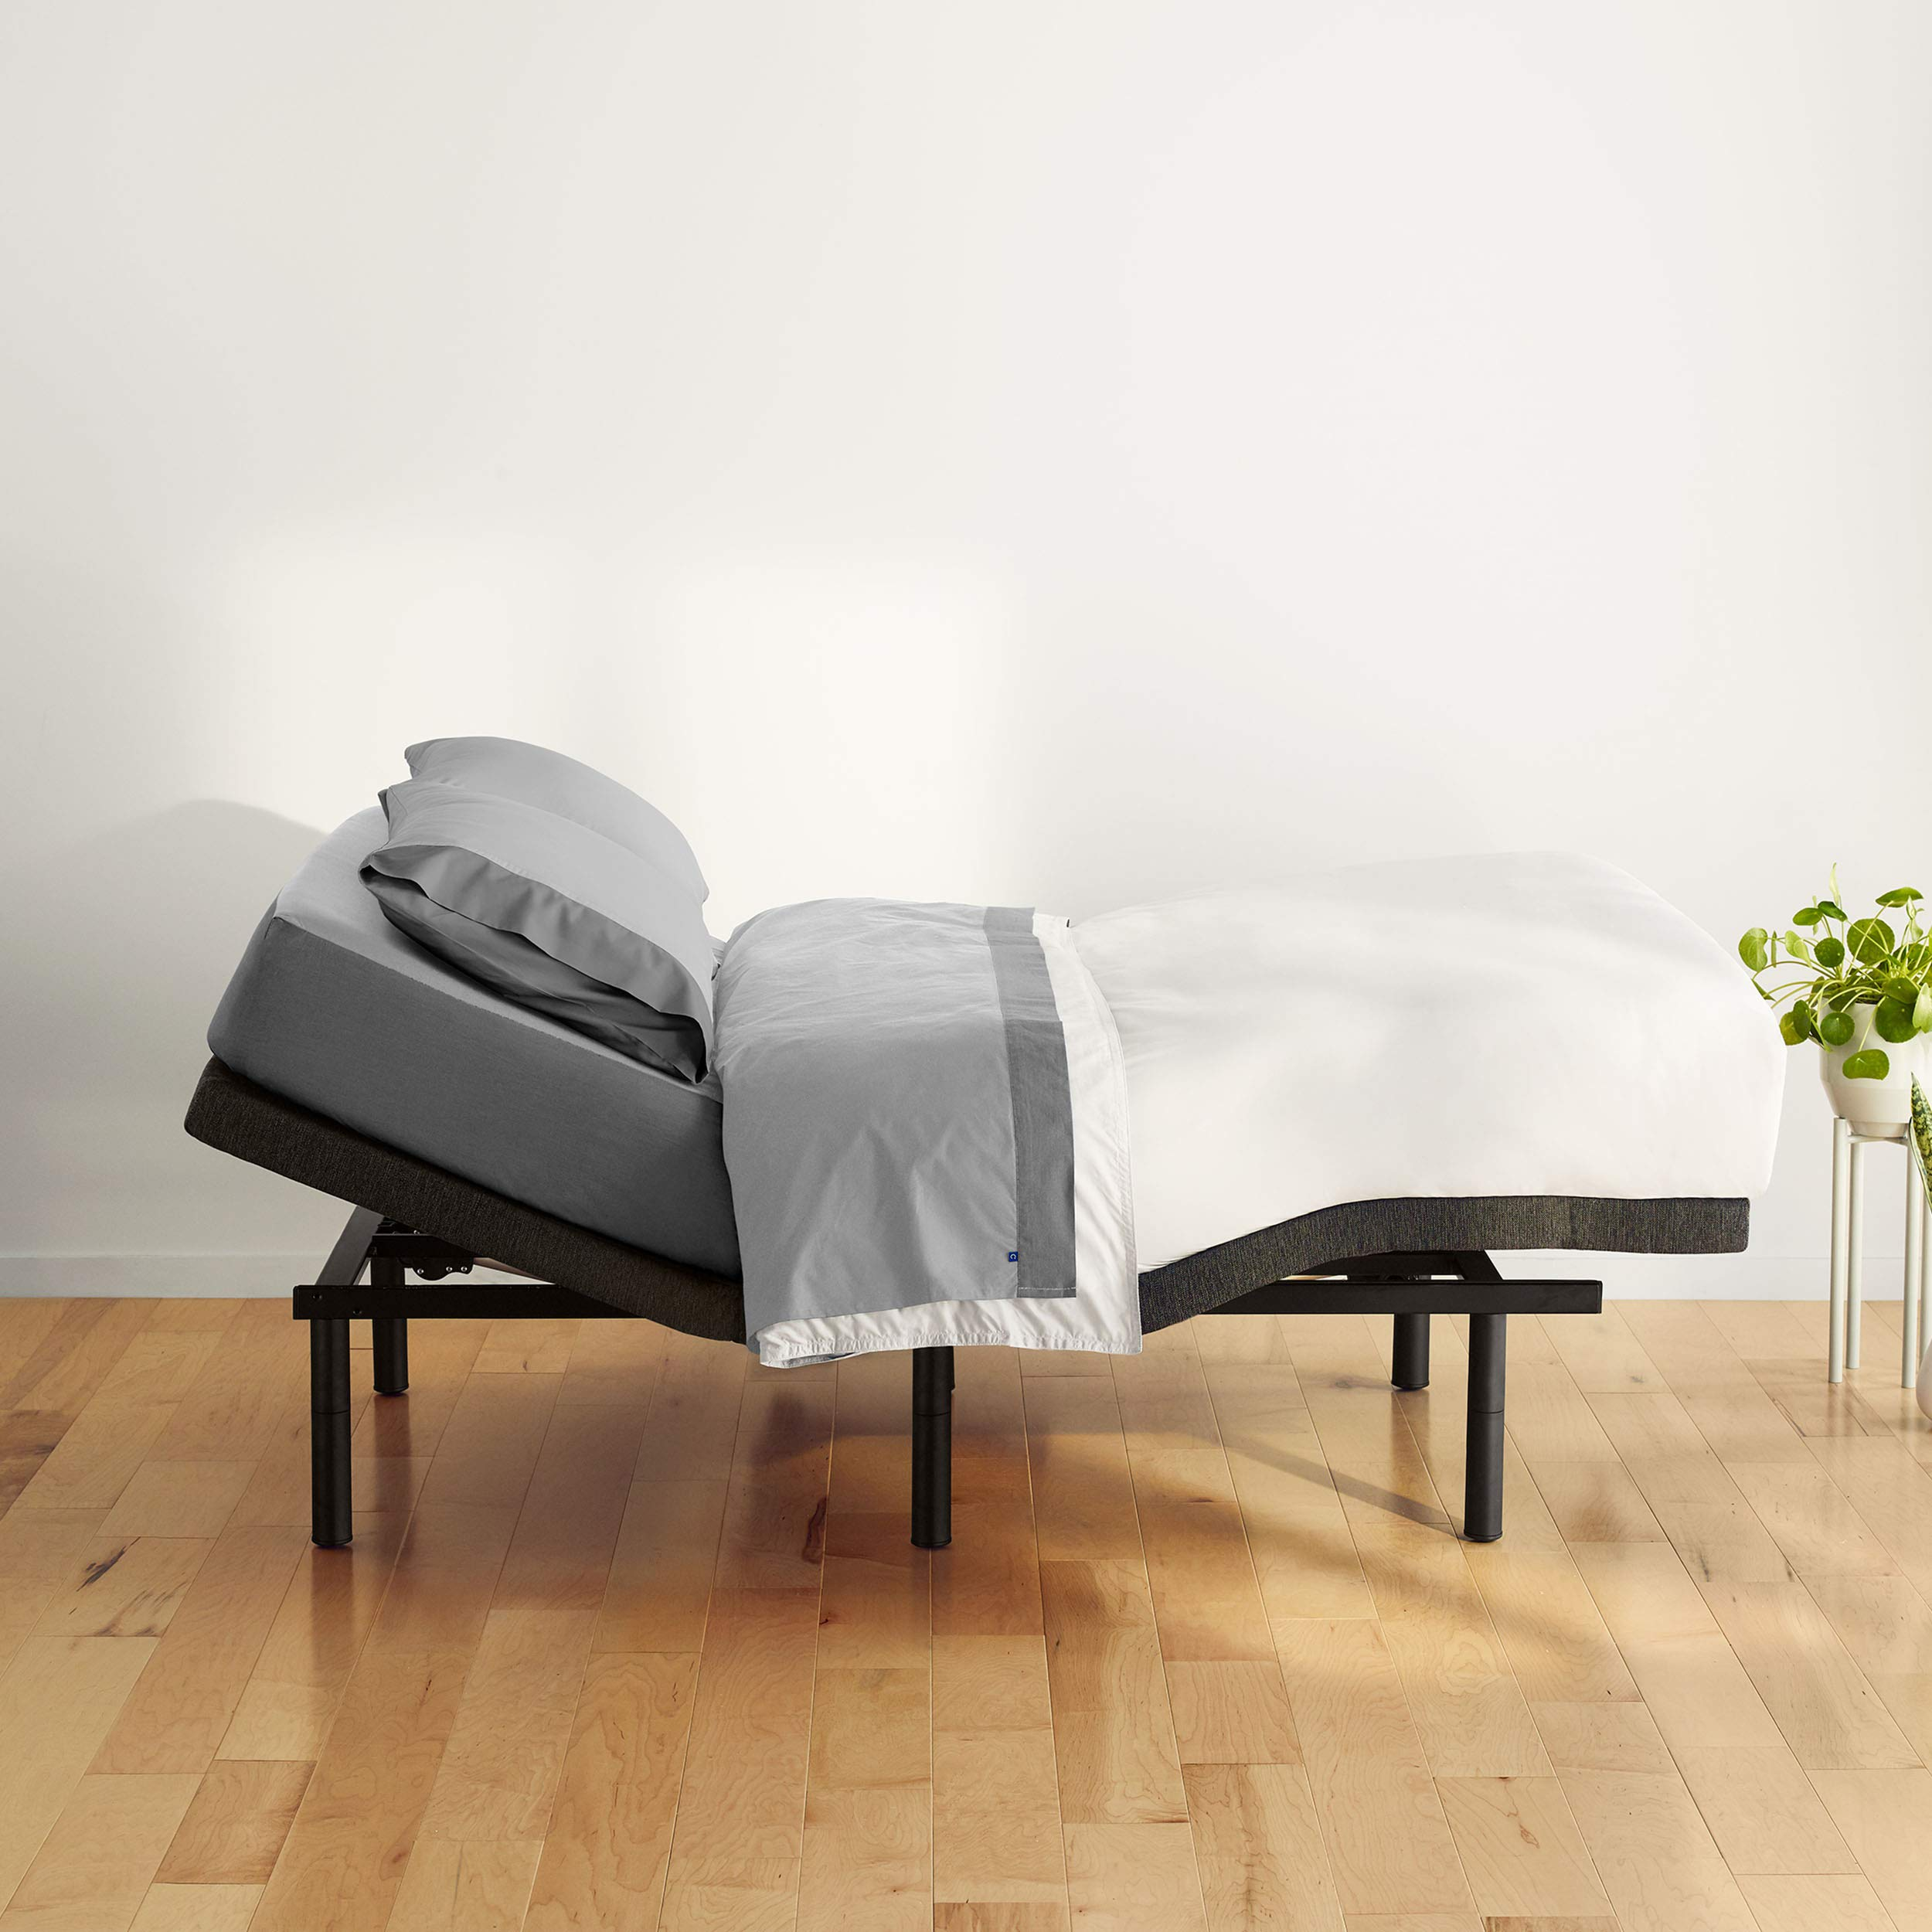 Casper Sleep Adjustable Bed Frame, Queen by Casper Sleep